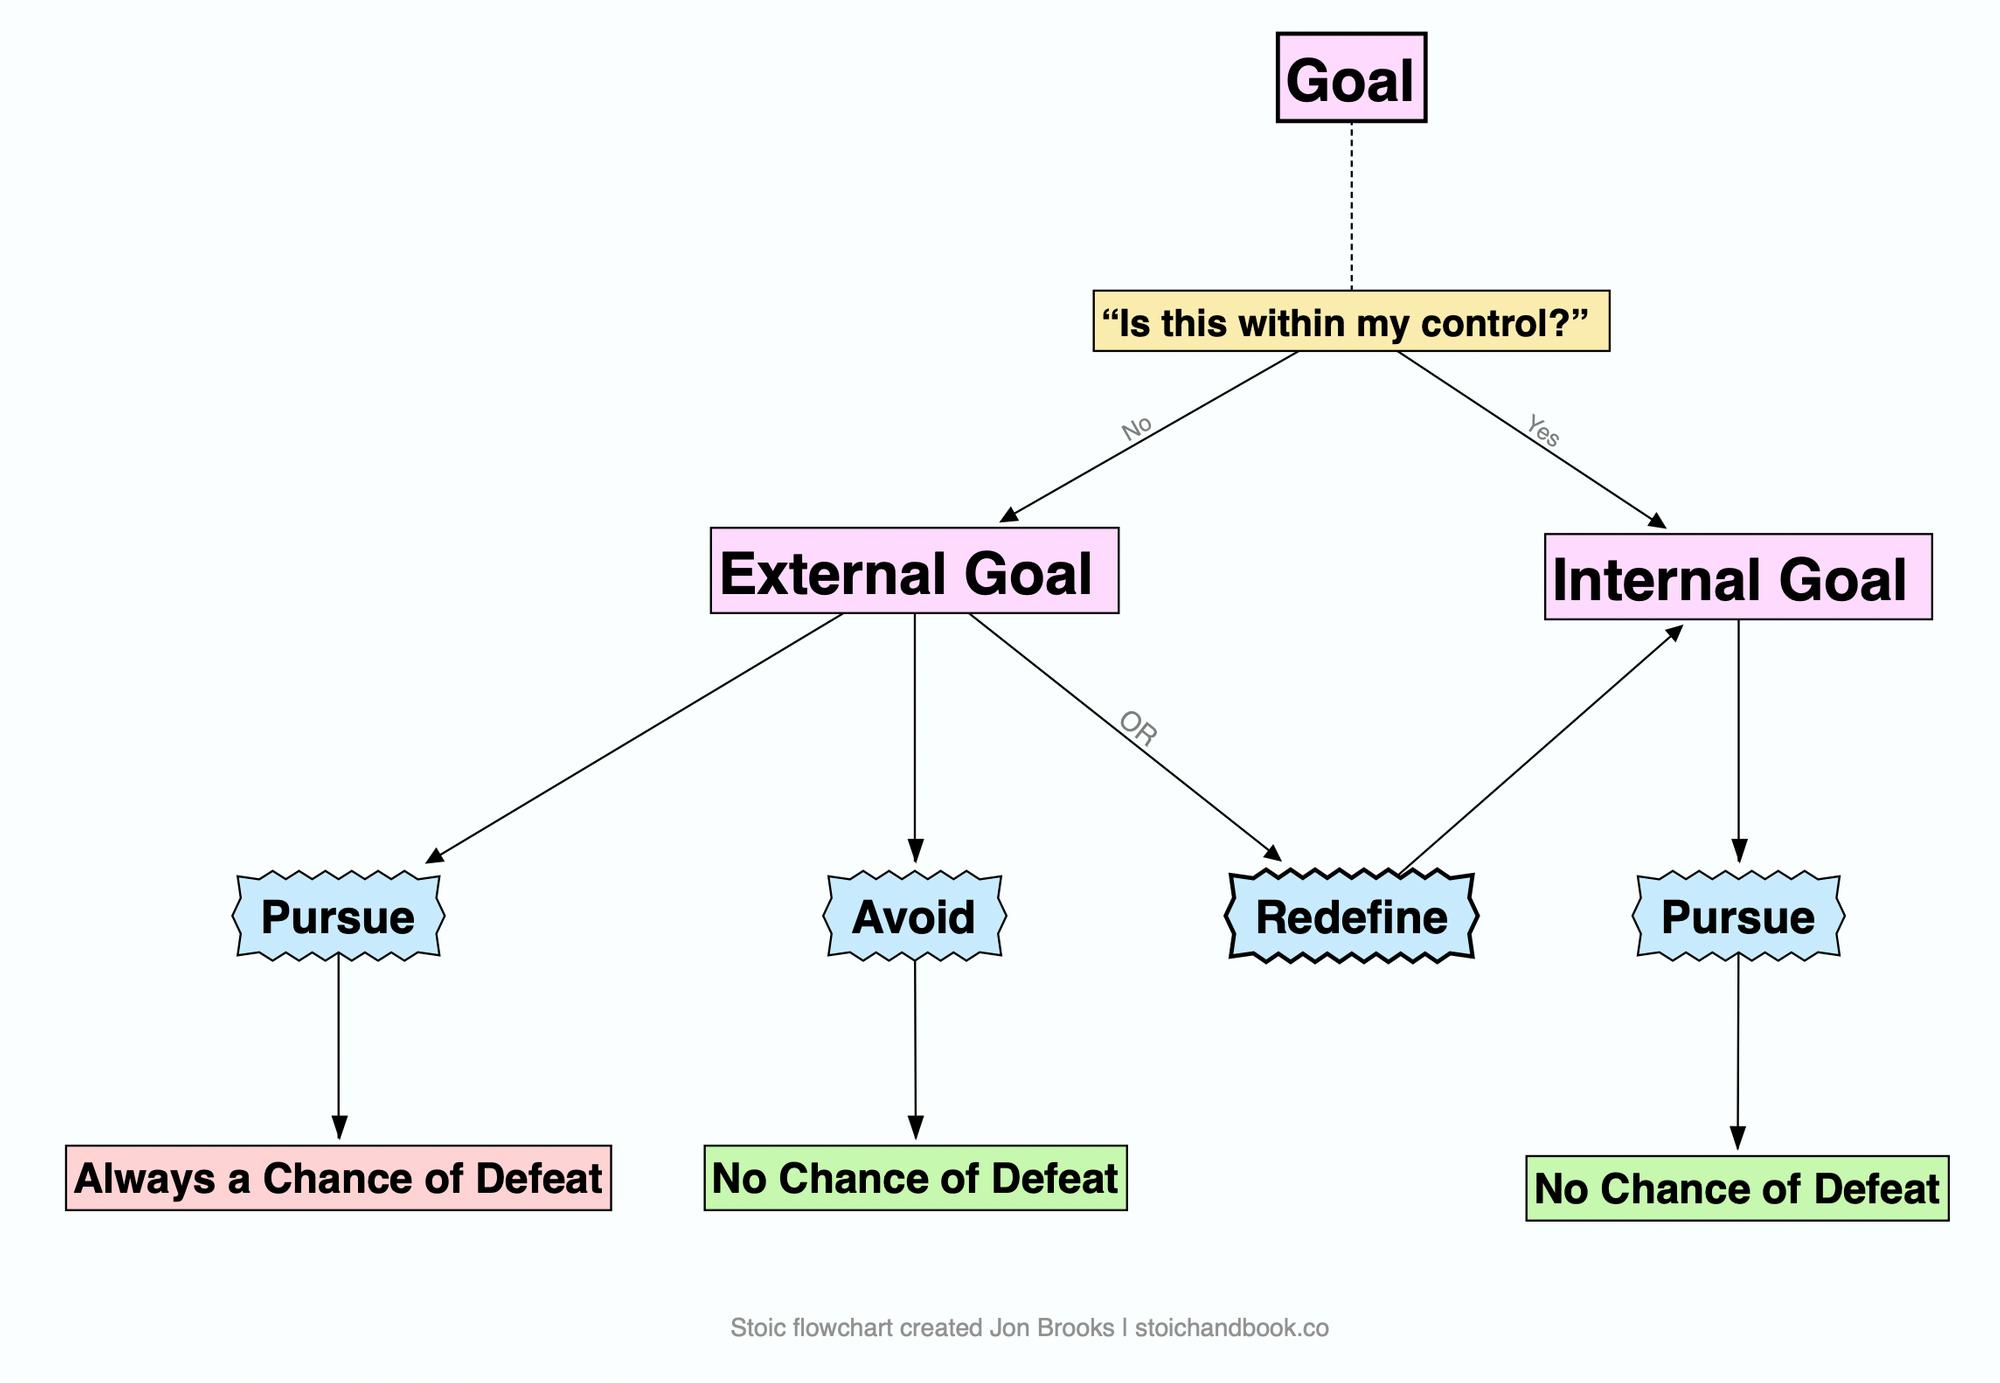 Stoic flowchart on setting goals